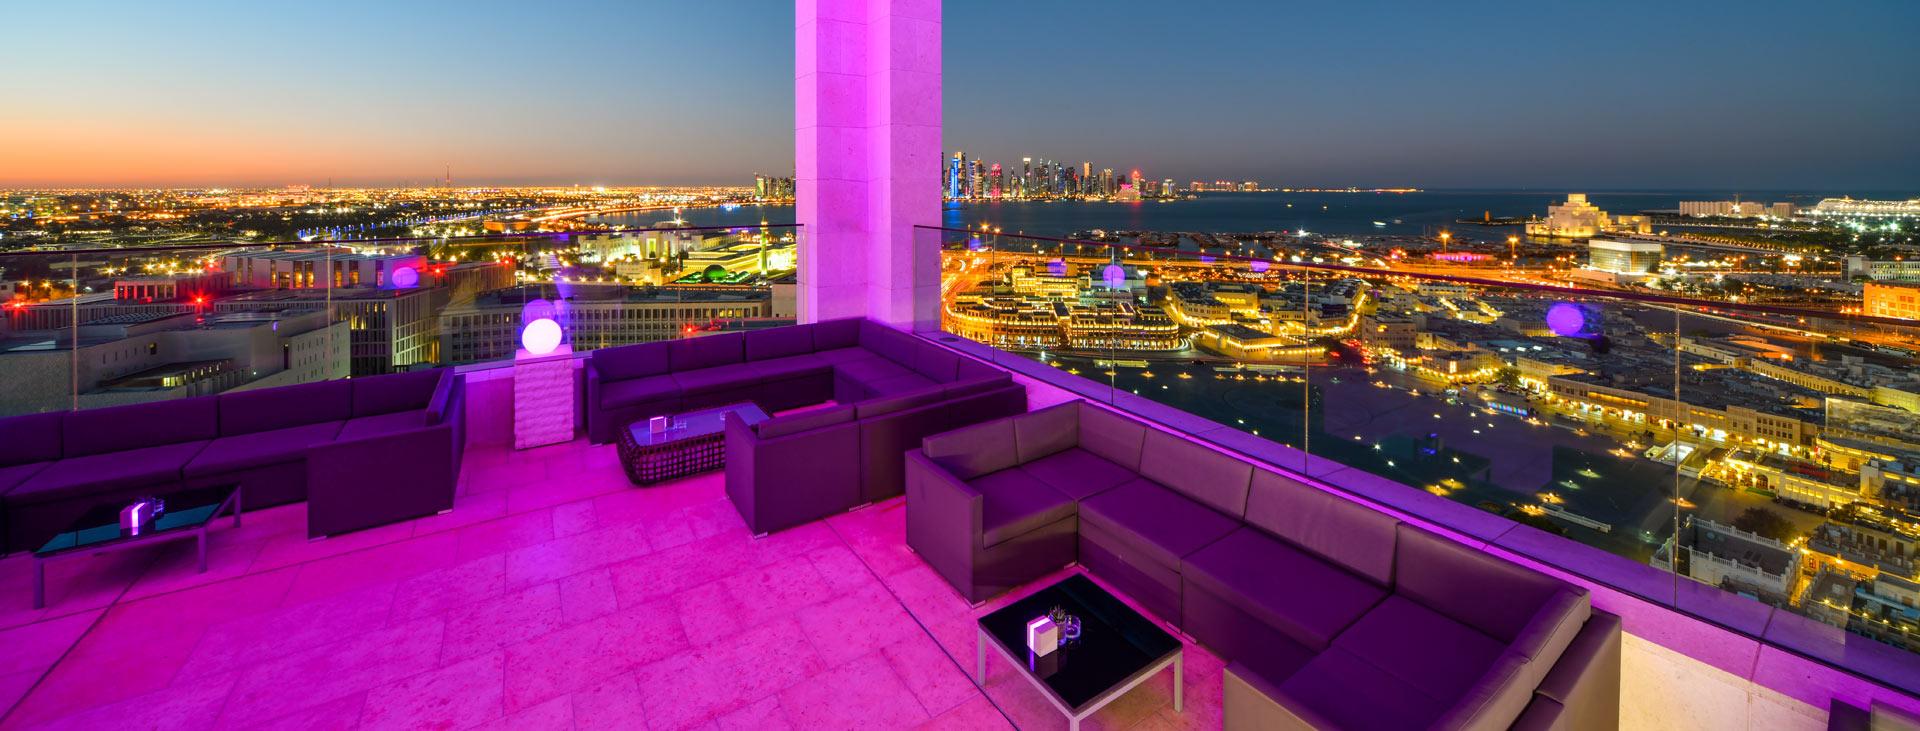 Alwadi Hotel Doha MGallery, Doha, Qatar